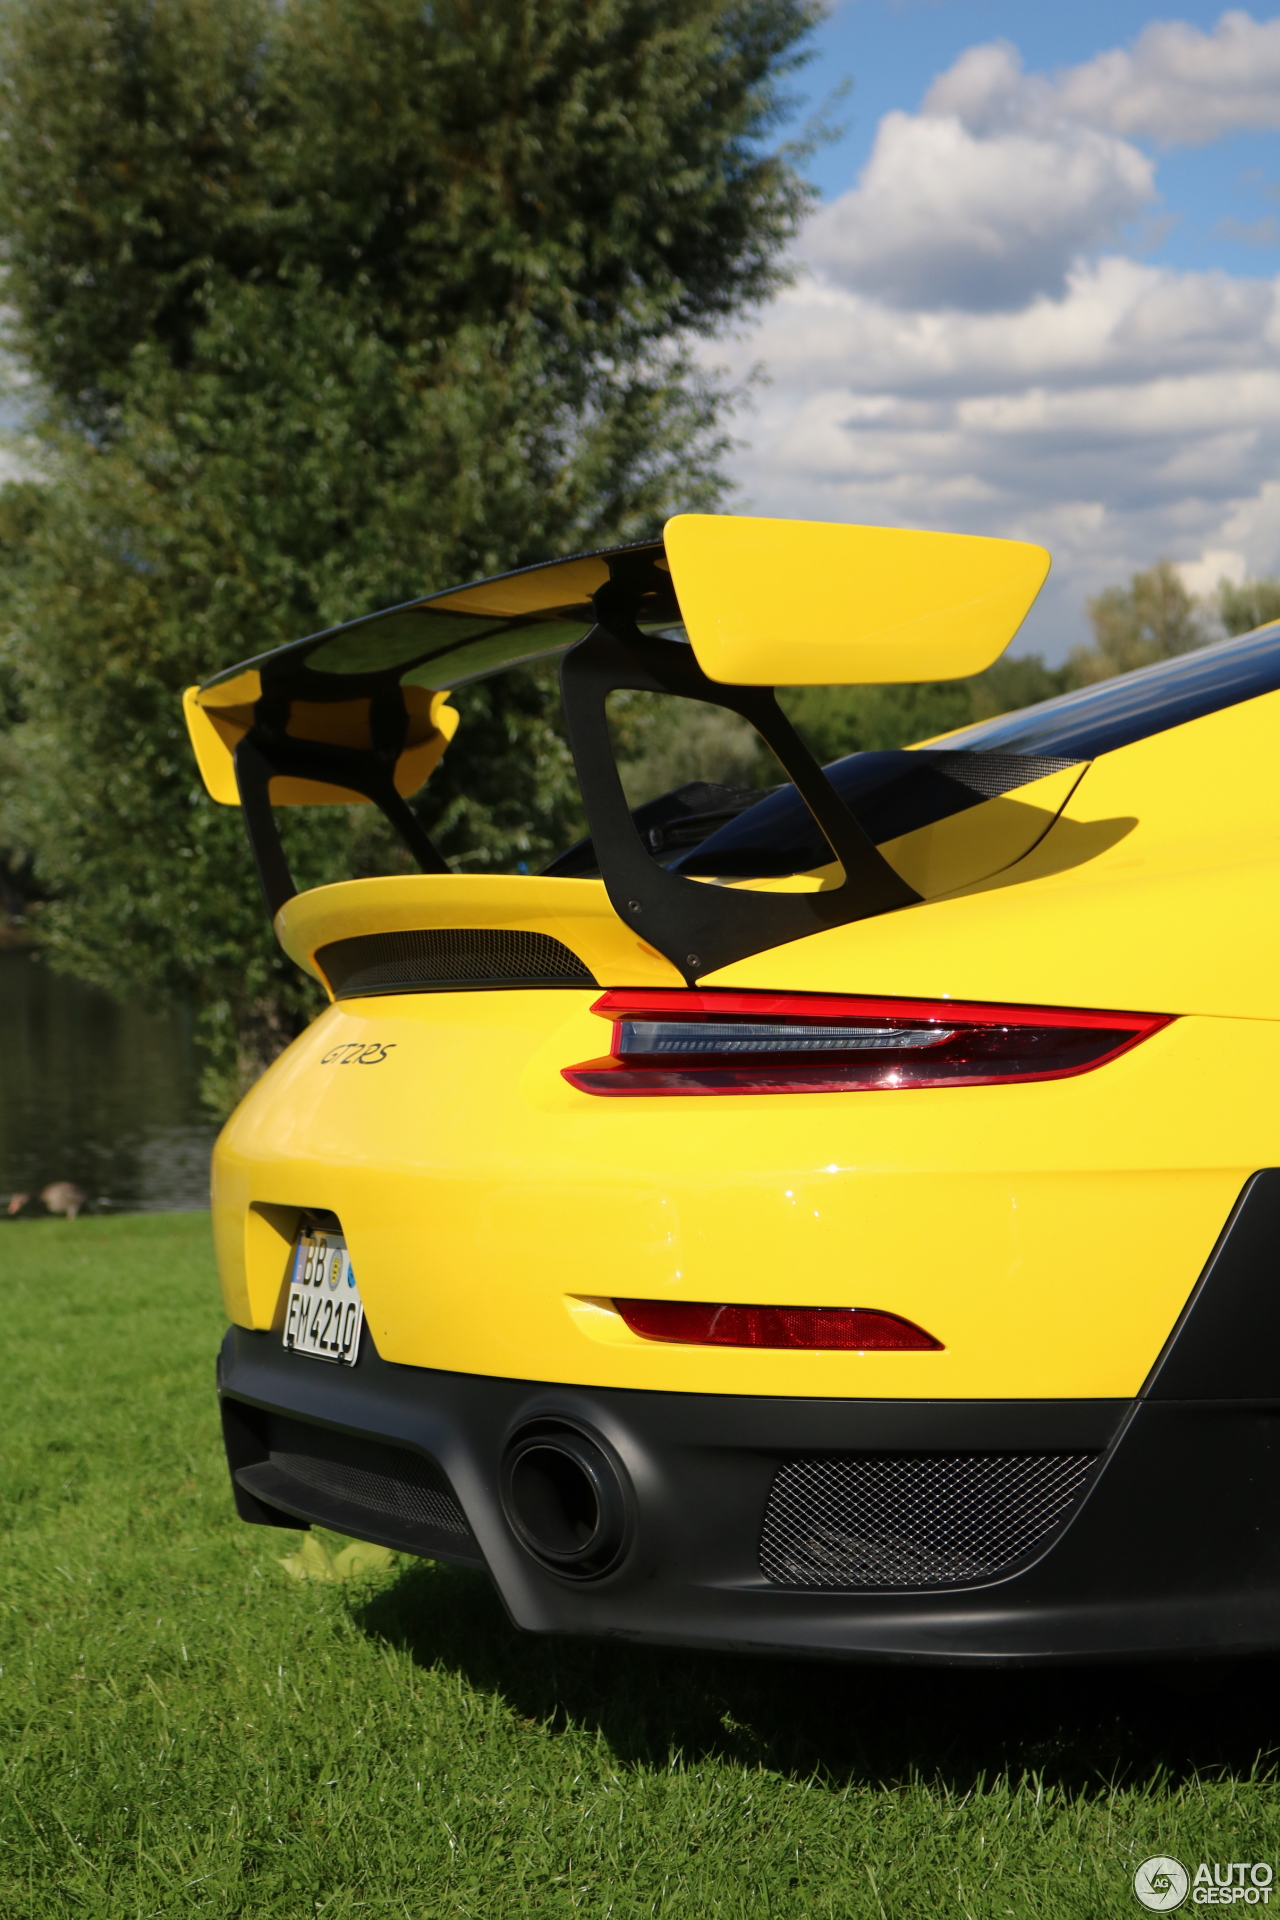 porsche-991-gt2-rs-c971616092017223838_3 Stunning Porsche 911 Gt2 Rs Vs Lamborghini Aventador Cars Trend